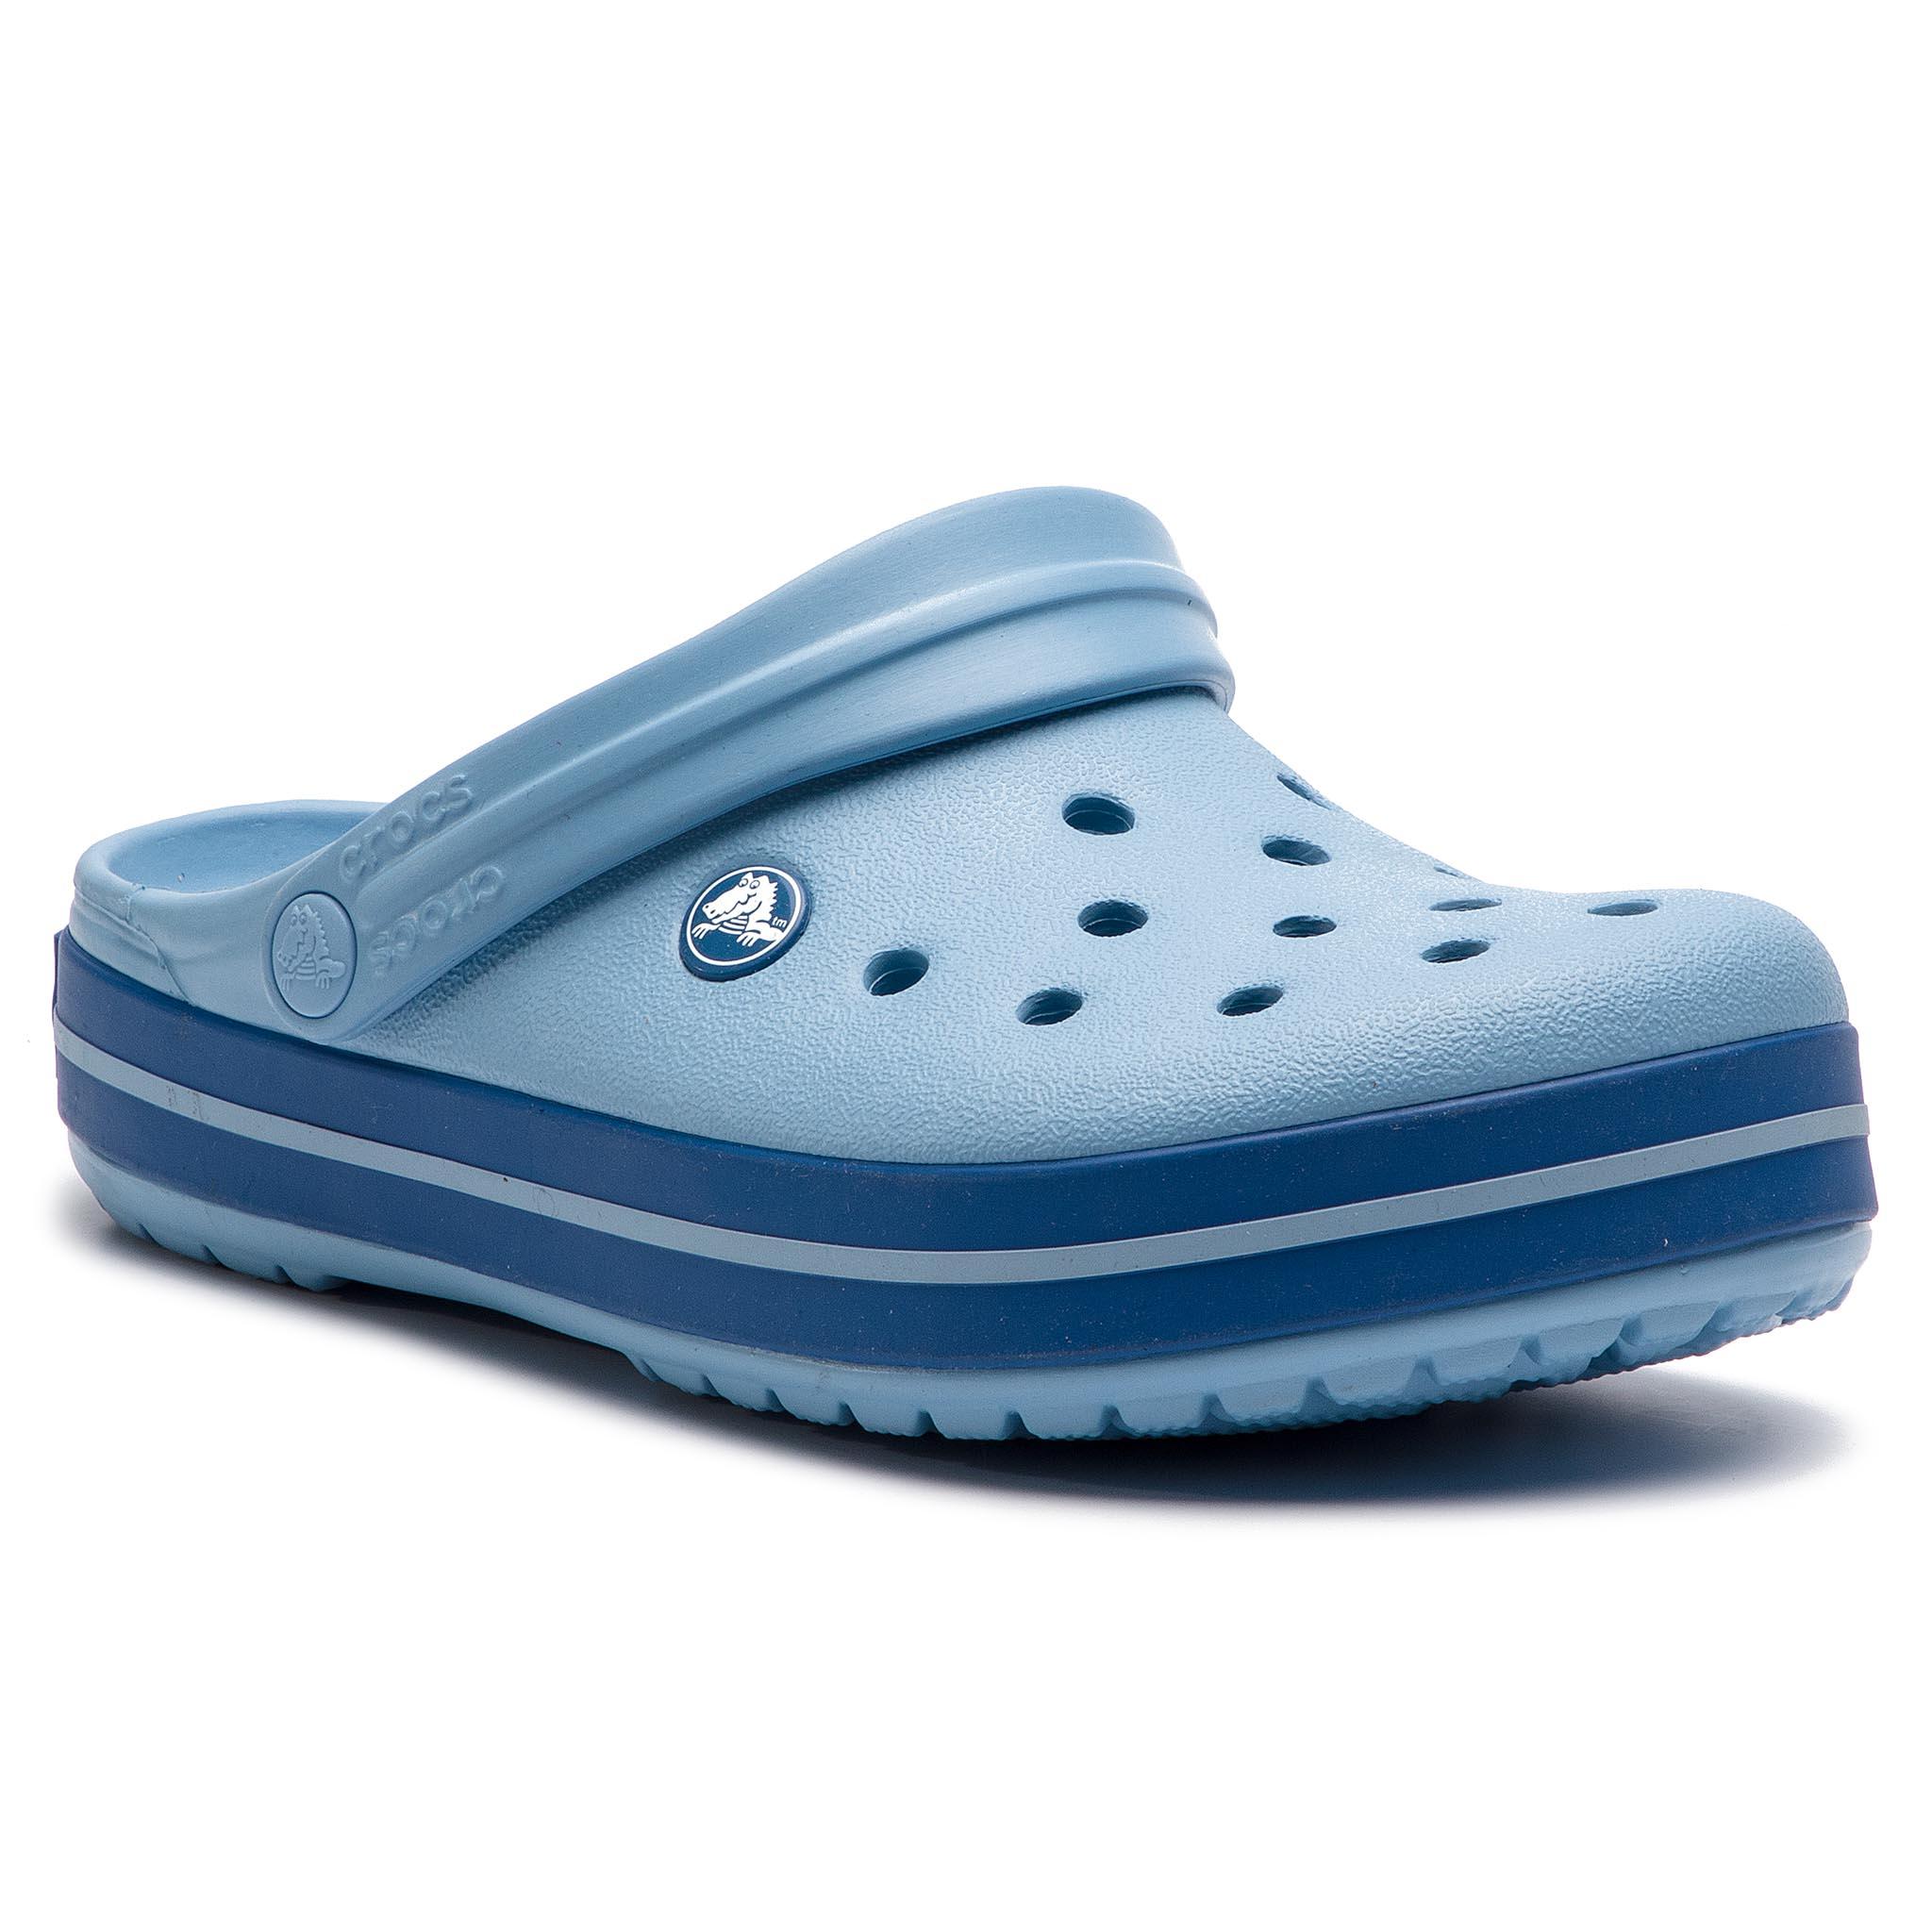 Papucs CROCS - Crocband 11016 Chambray Blue Blue Jean - Glami.hu fddcb9678f